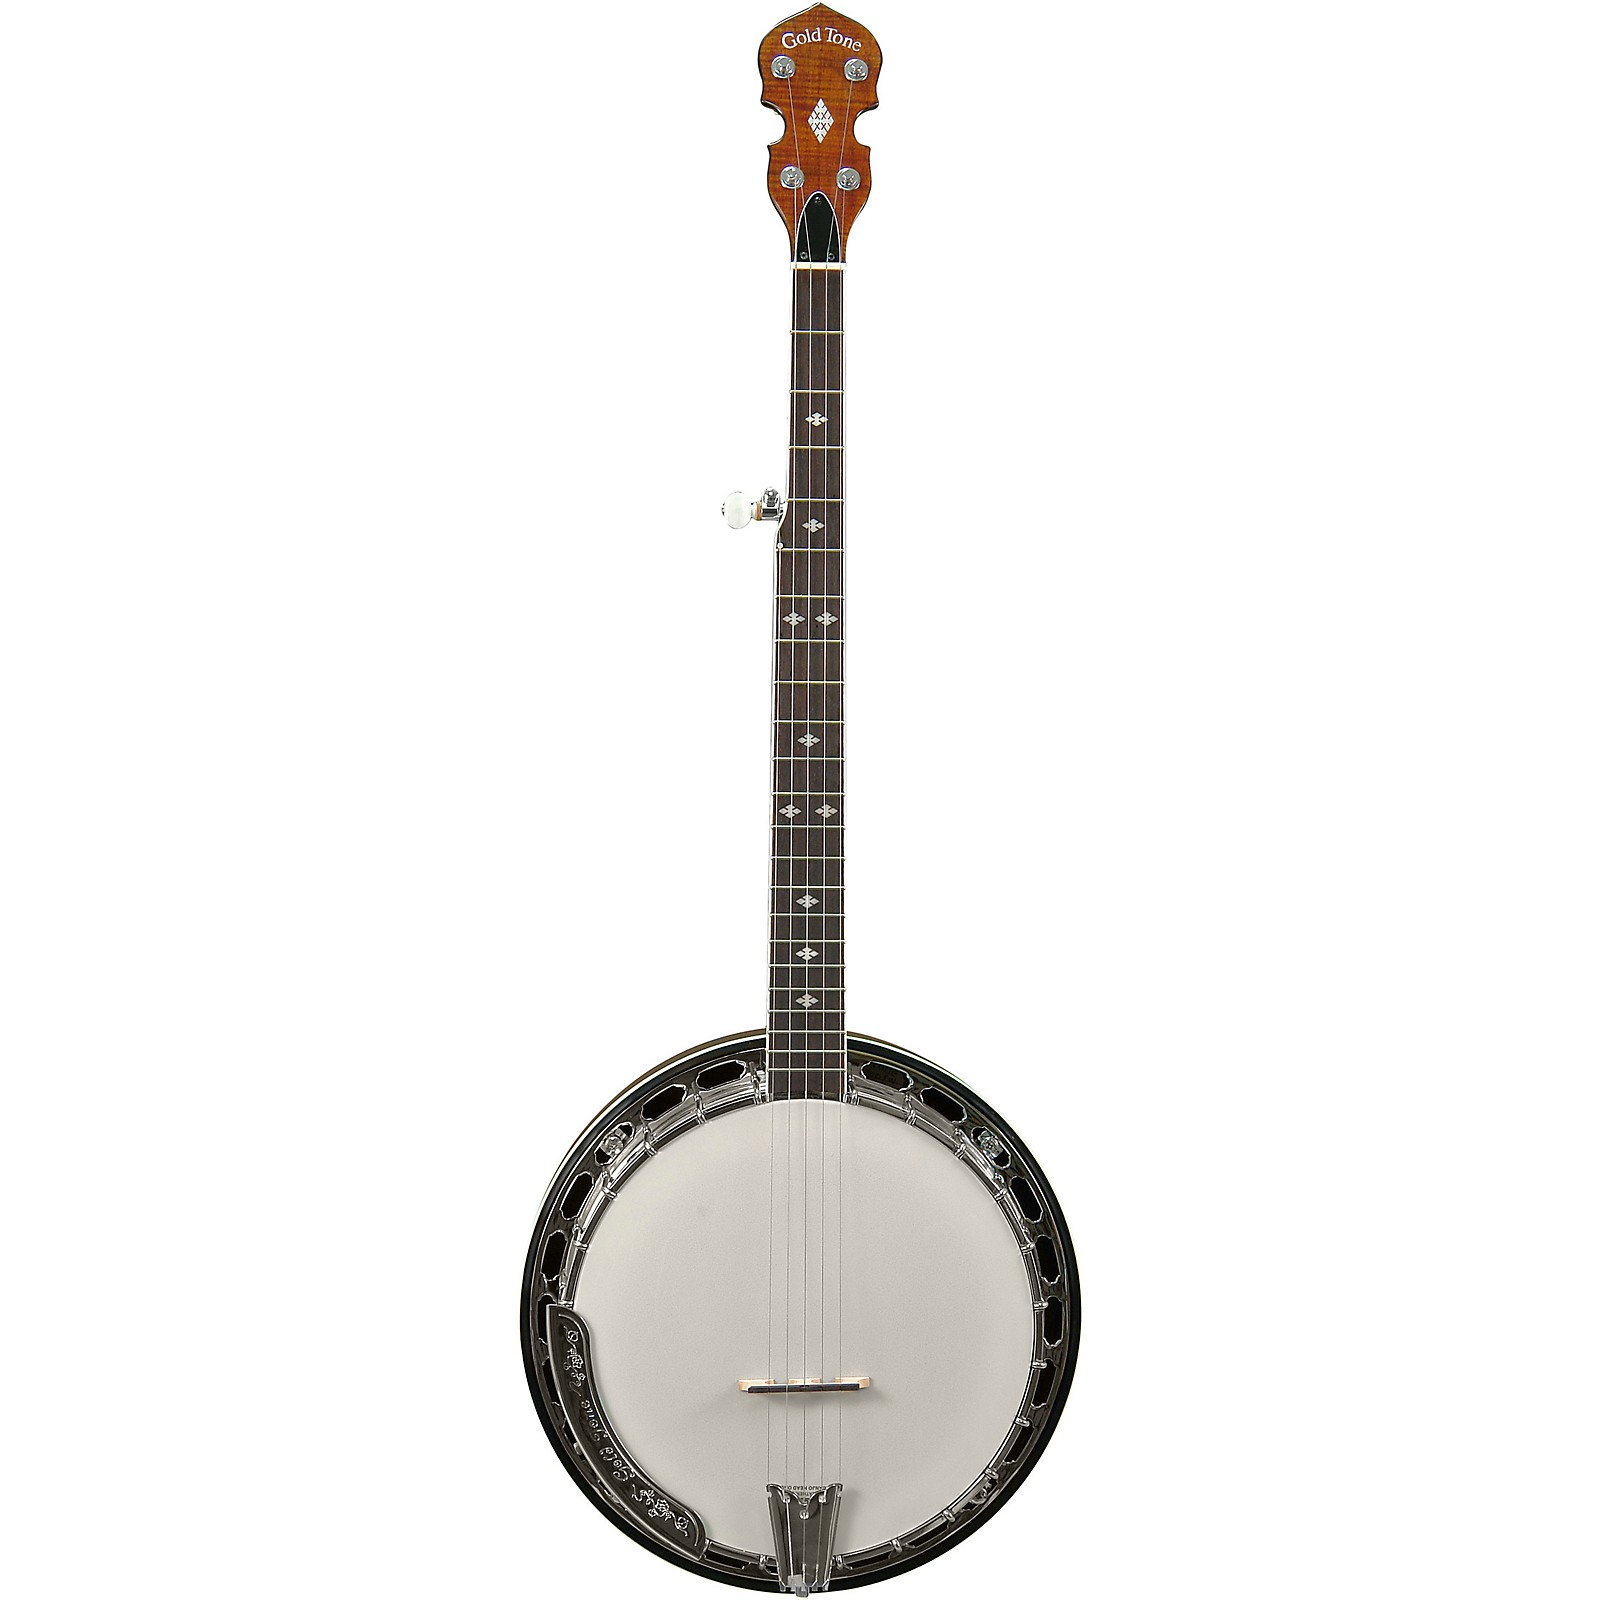 Gold Tone BG-250FW 5-String Banjo